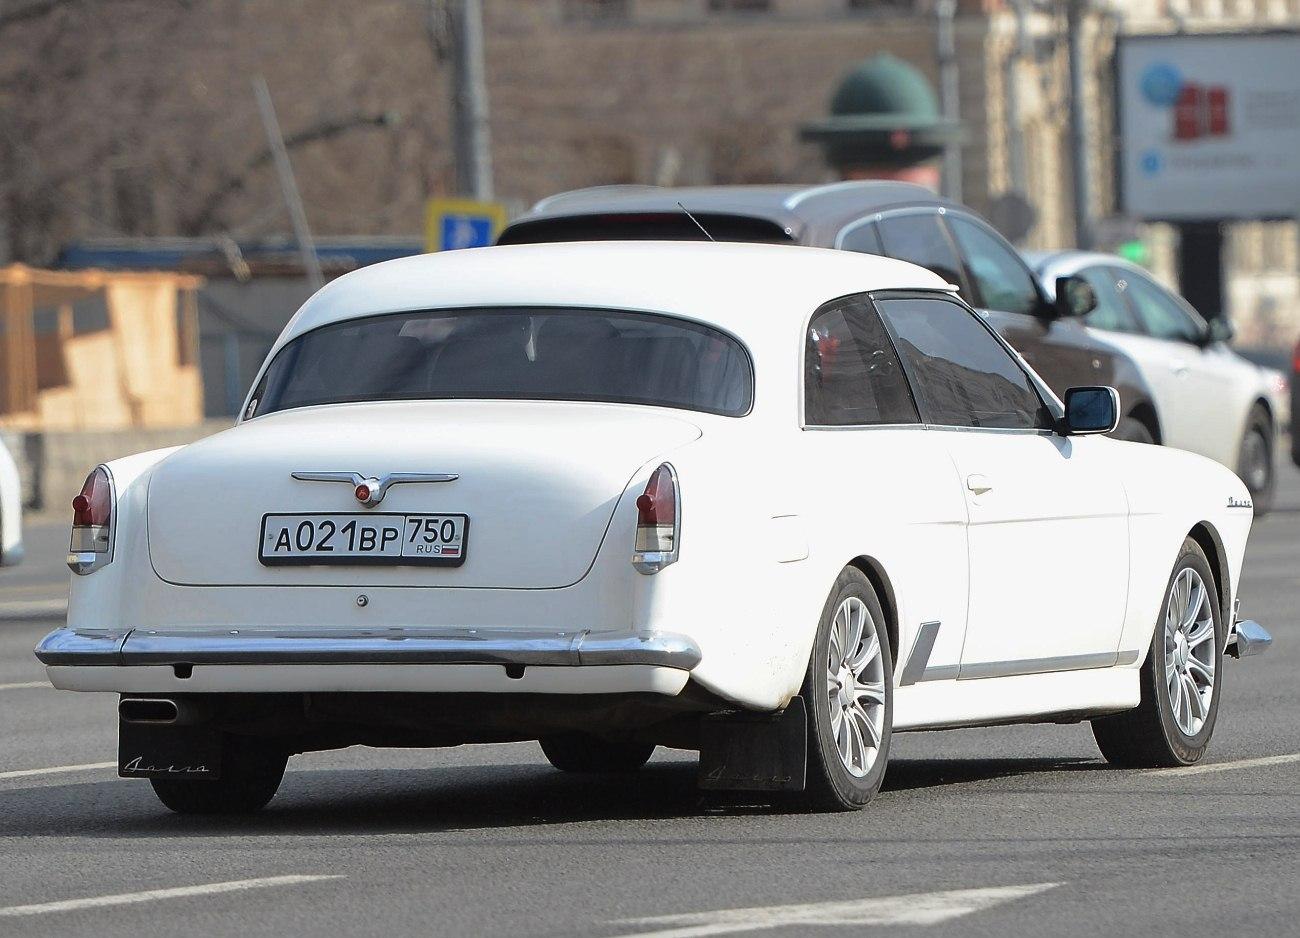 2010 (?). САМАВТО. Россия. Тула